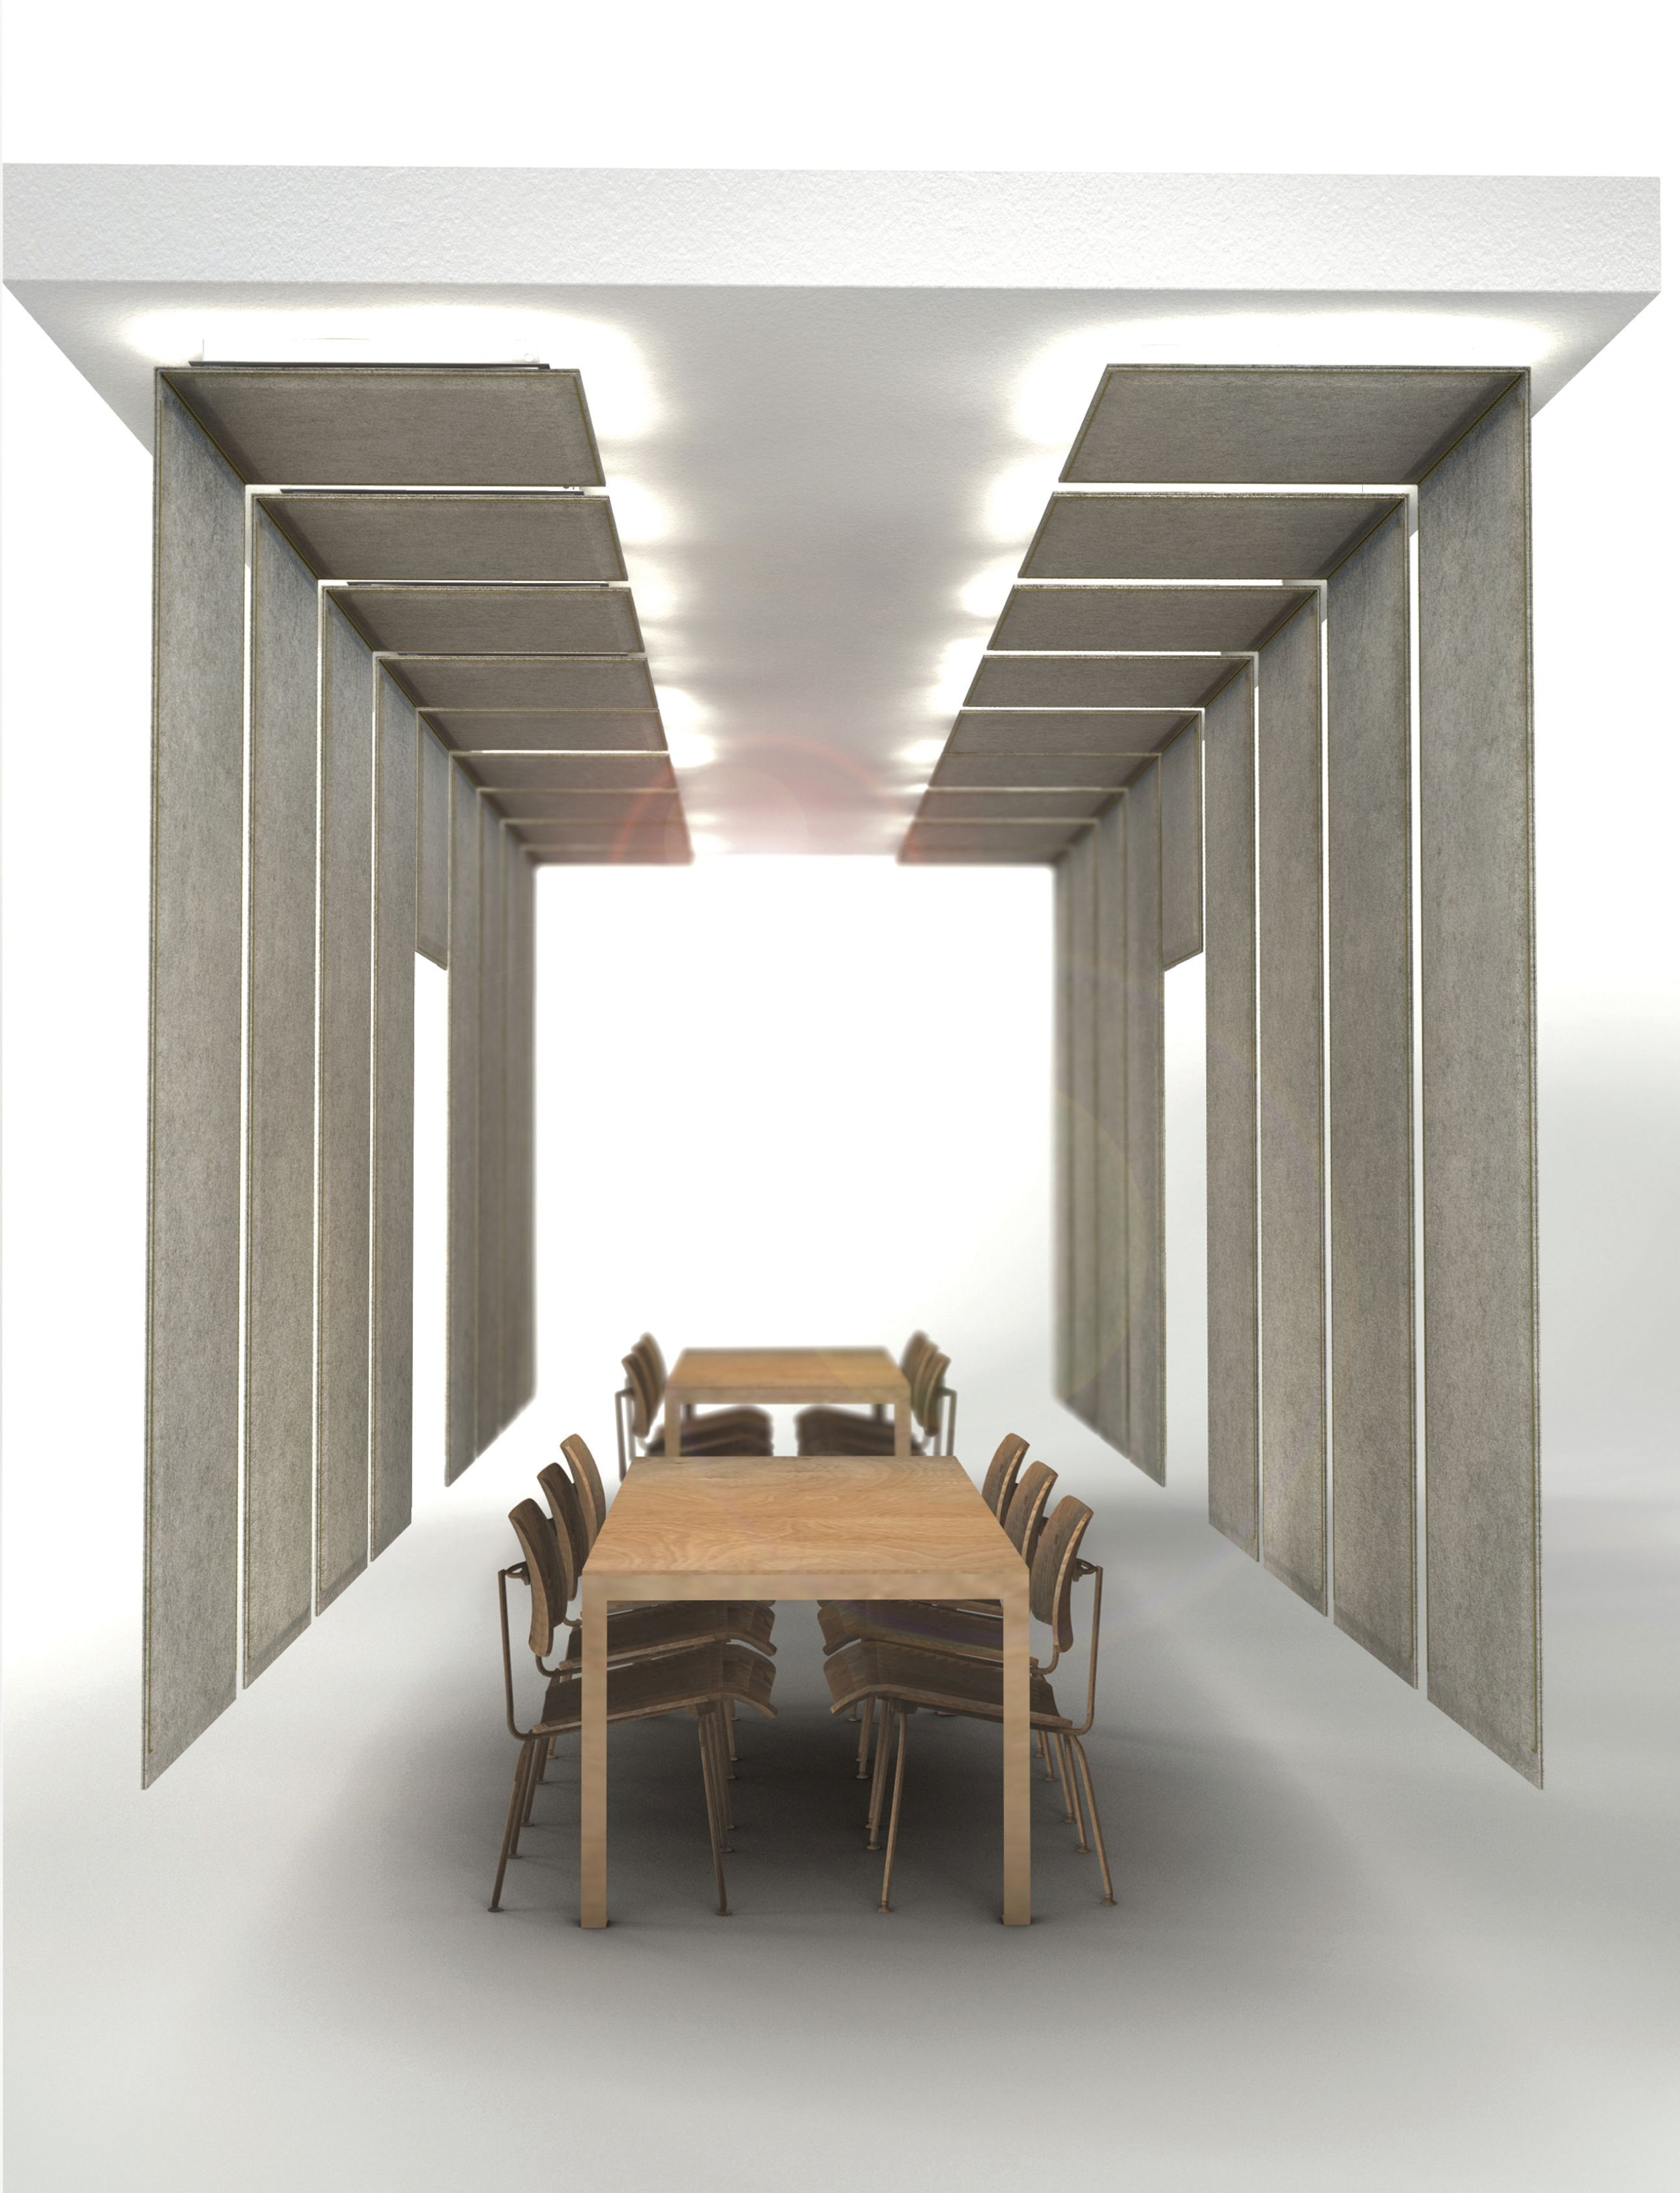 Buzziwings by Buzzi Space Corporate interior design